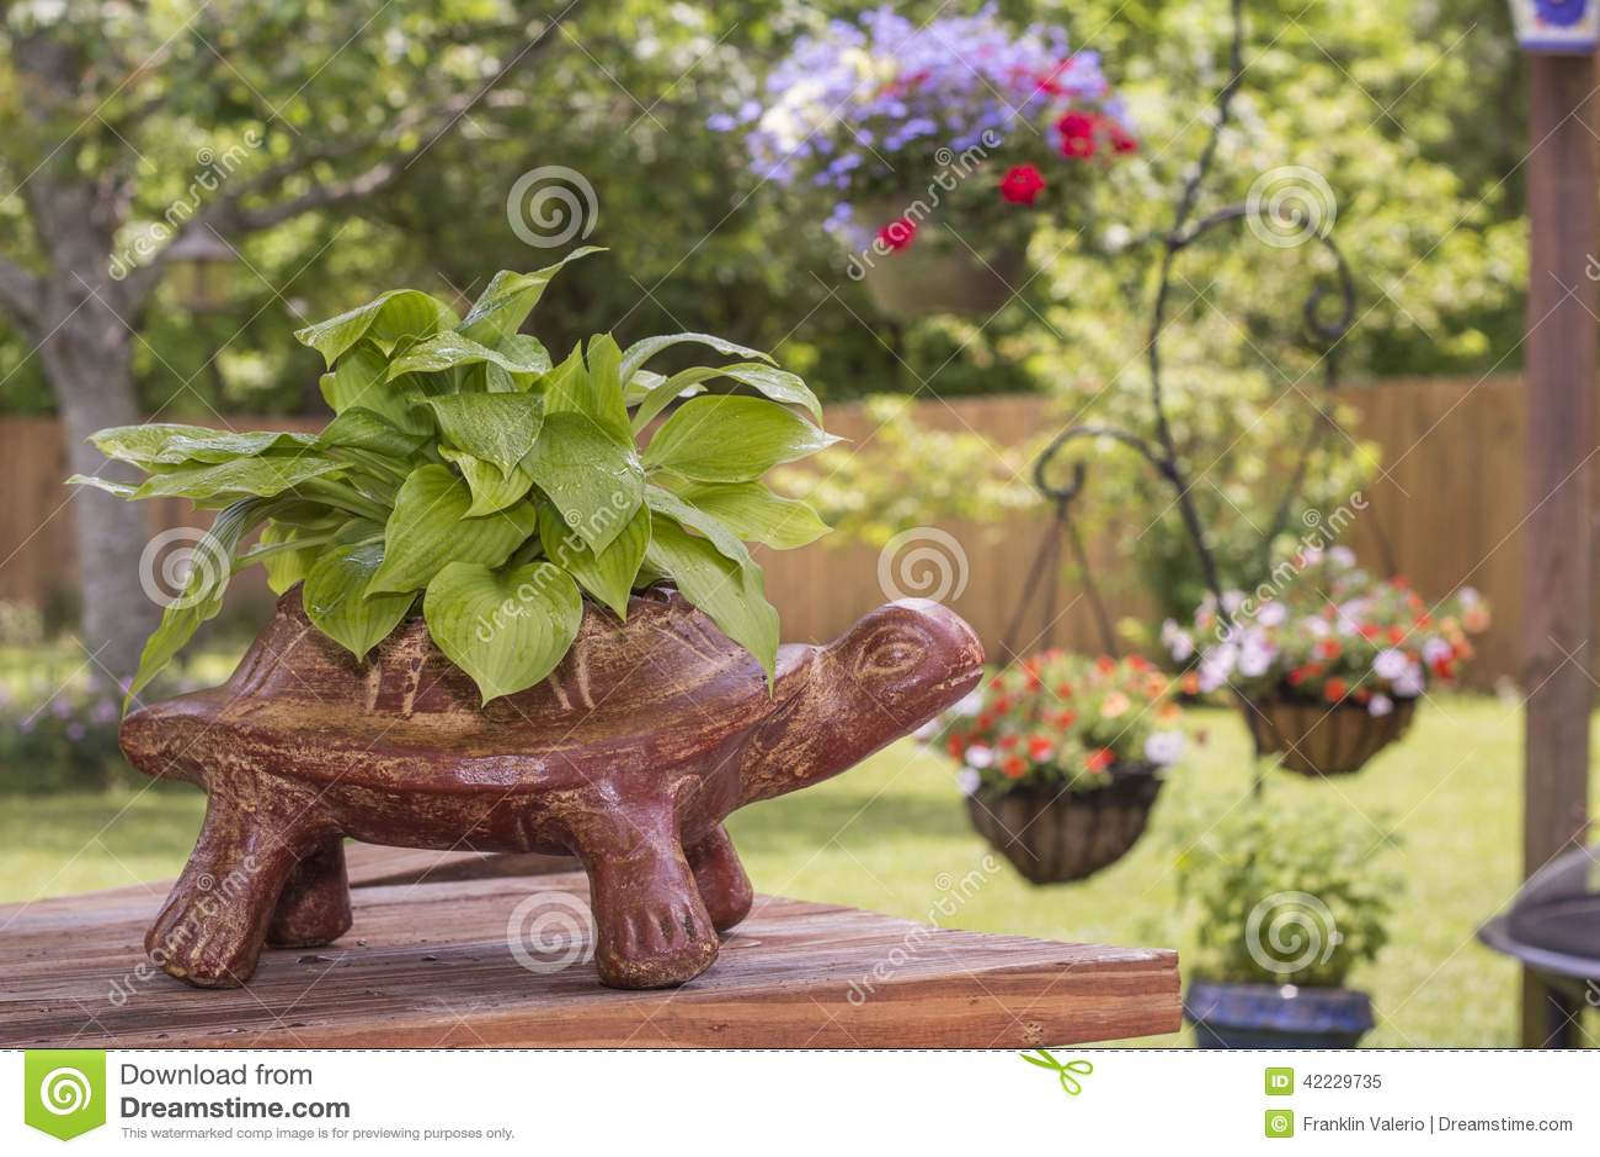 Turtle Planter Stock Image